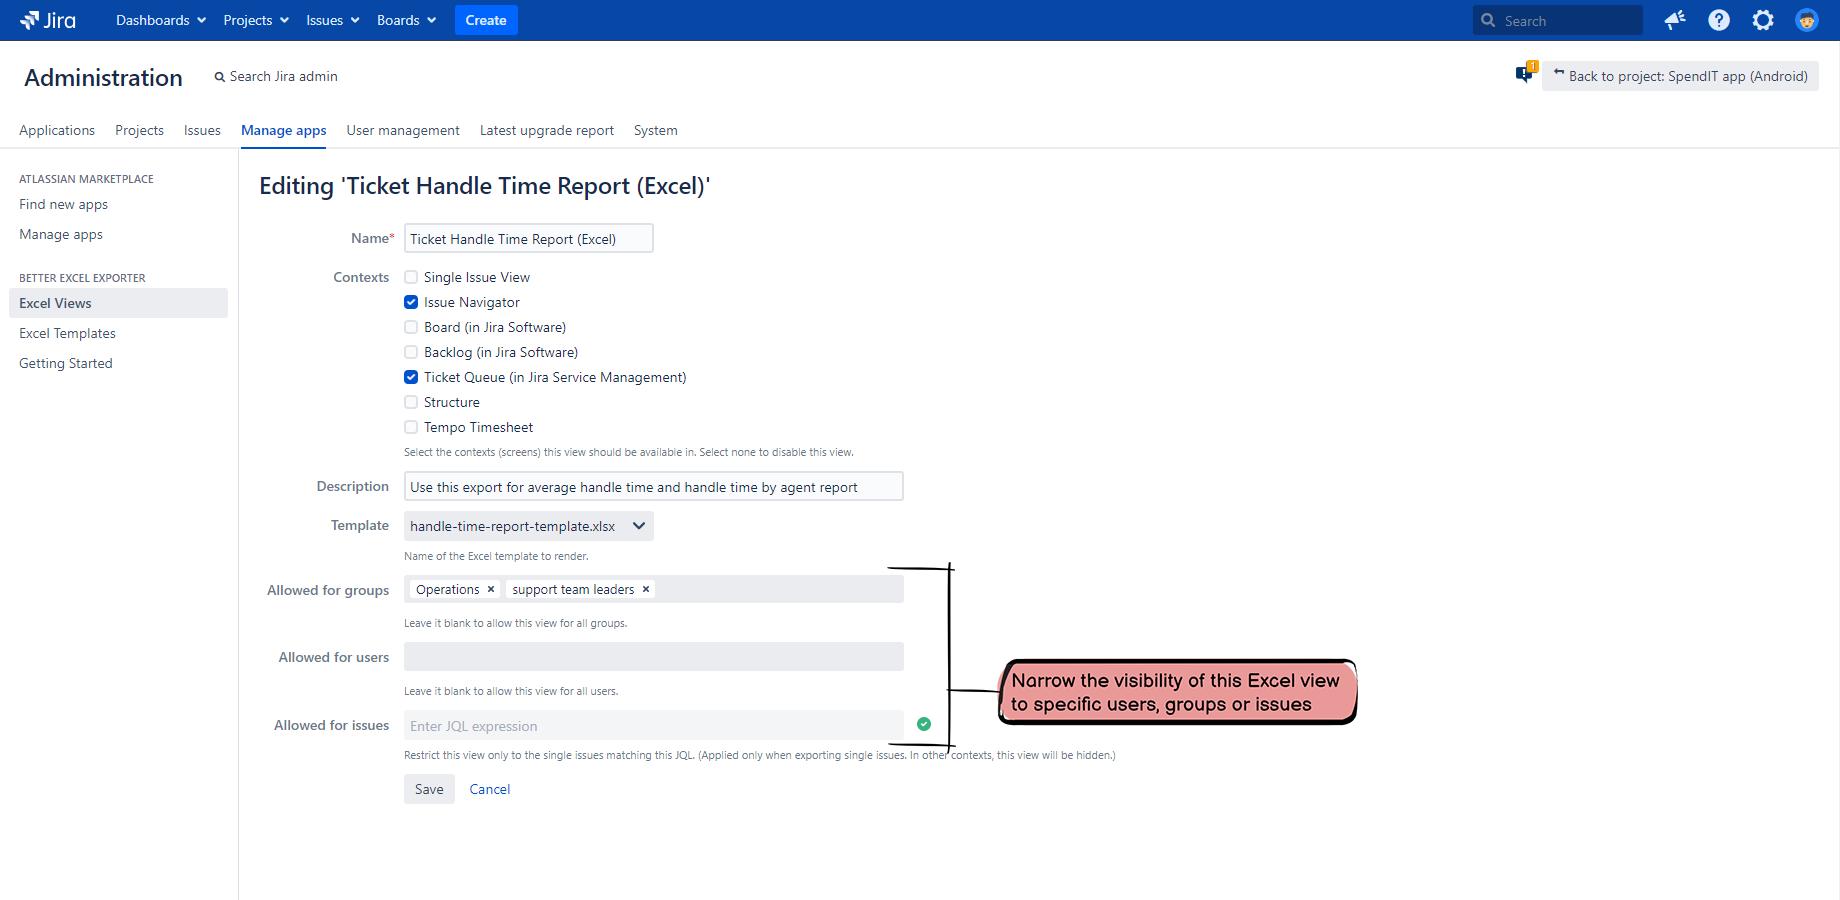 Version History - Better Excel Exporter for Jira | Midori